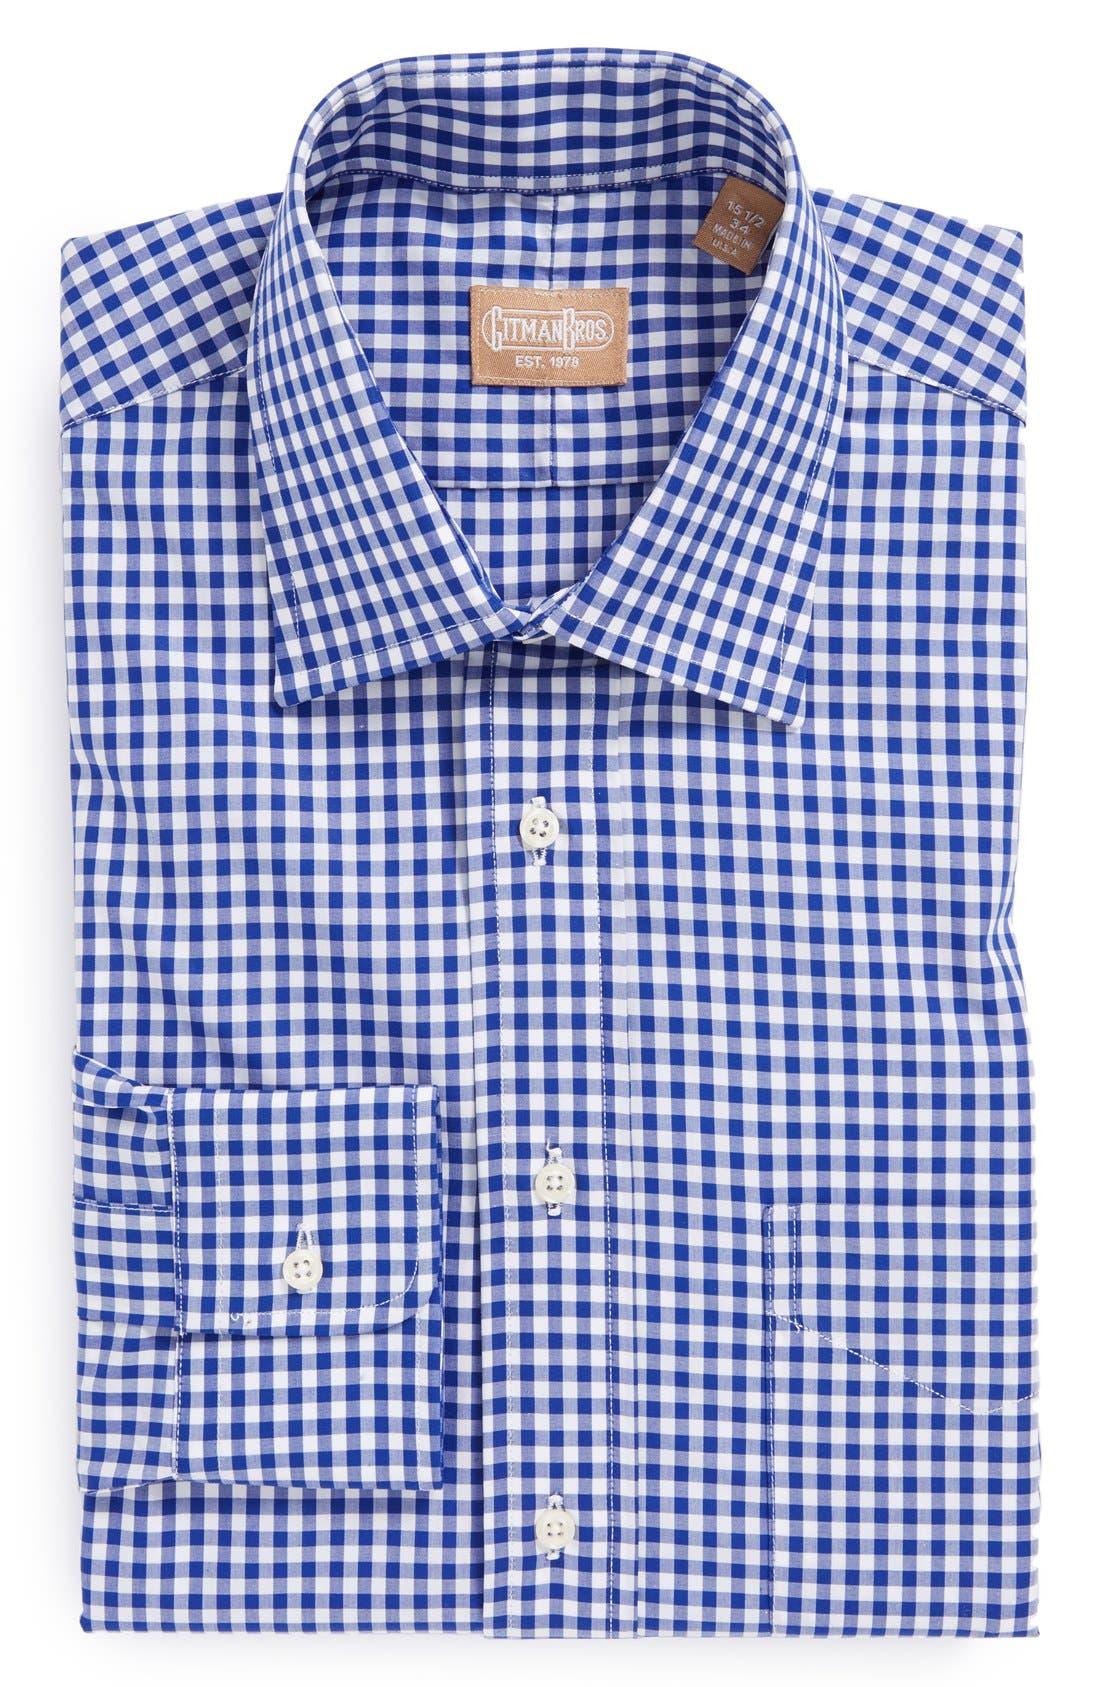 Main Image - Gitman Regular Fit Cotton Gingham English Spread Collar Dress Shirt